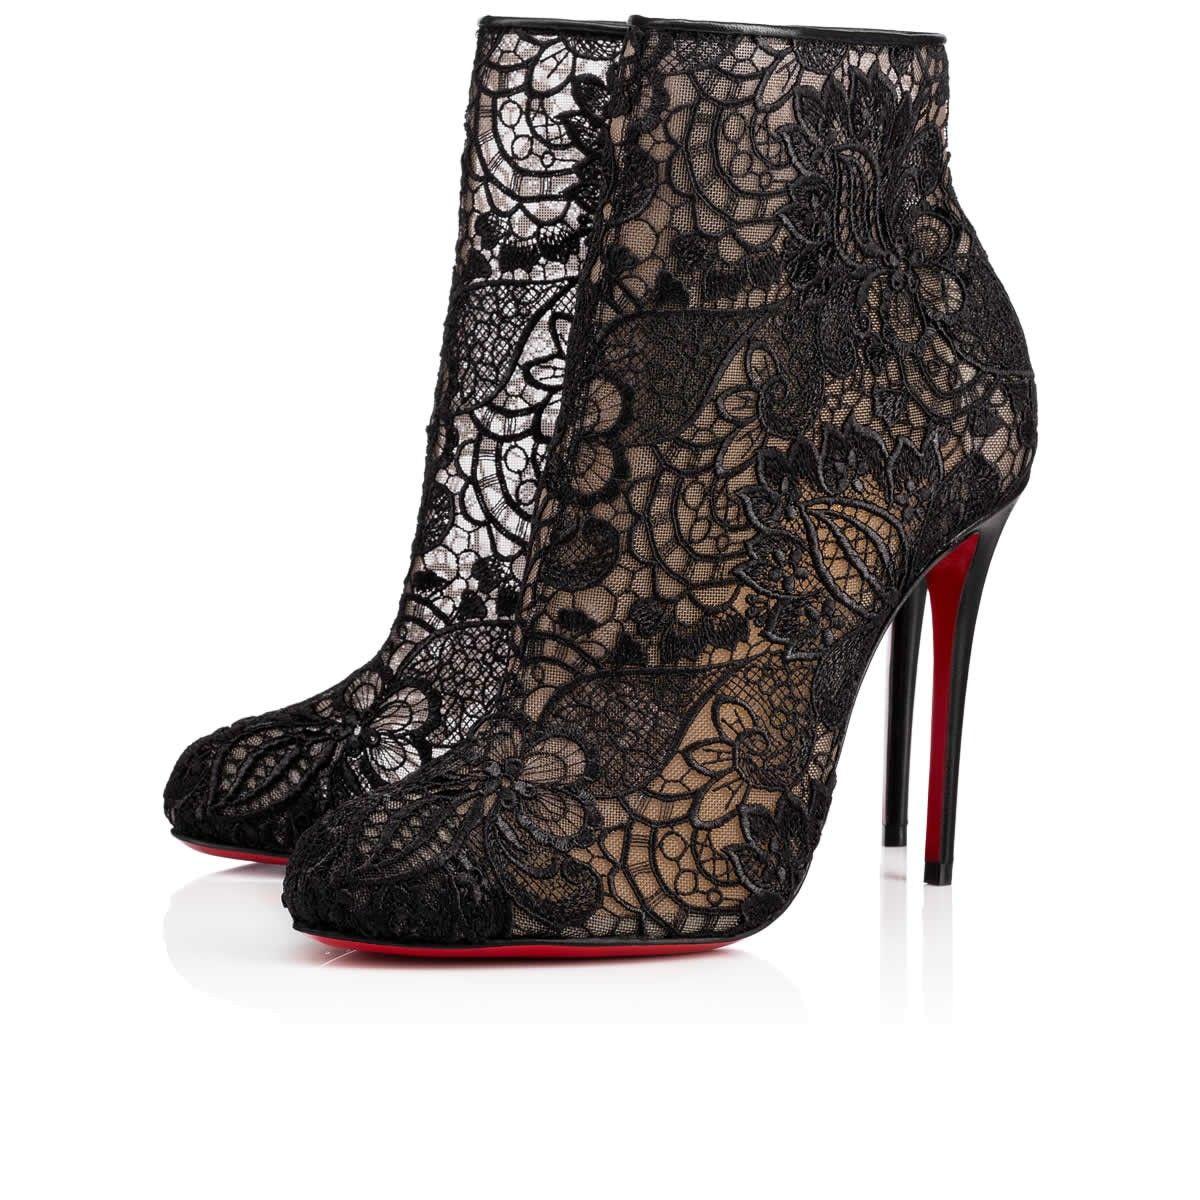 d2f760f83c1 Shoes - Miss Tennis - Christian Louboutin | Bootsies | Christian ...